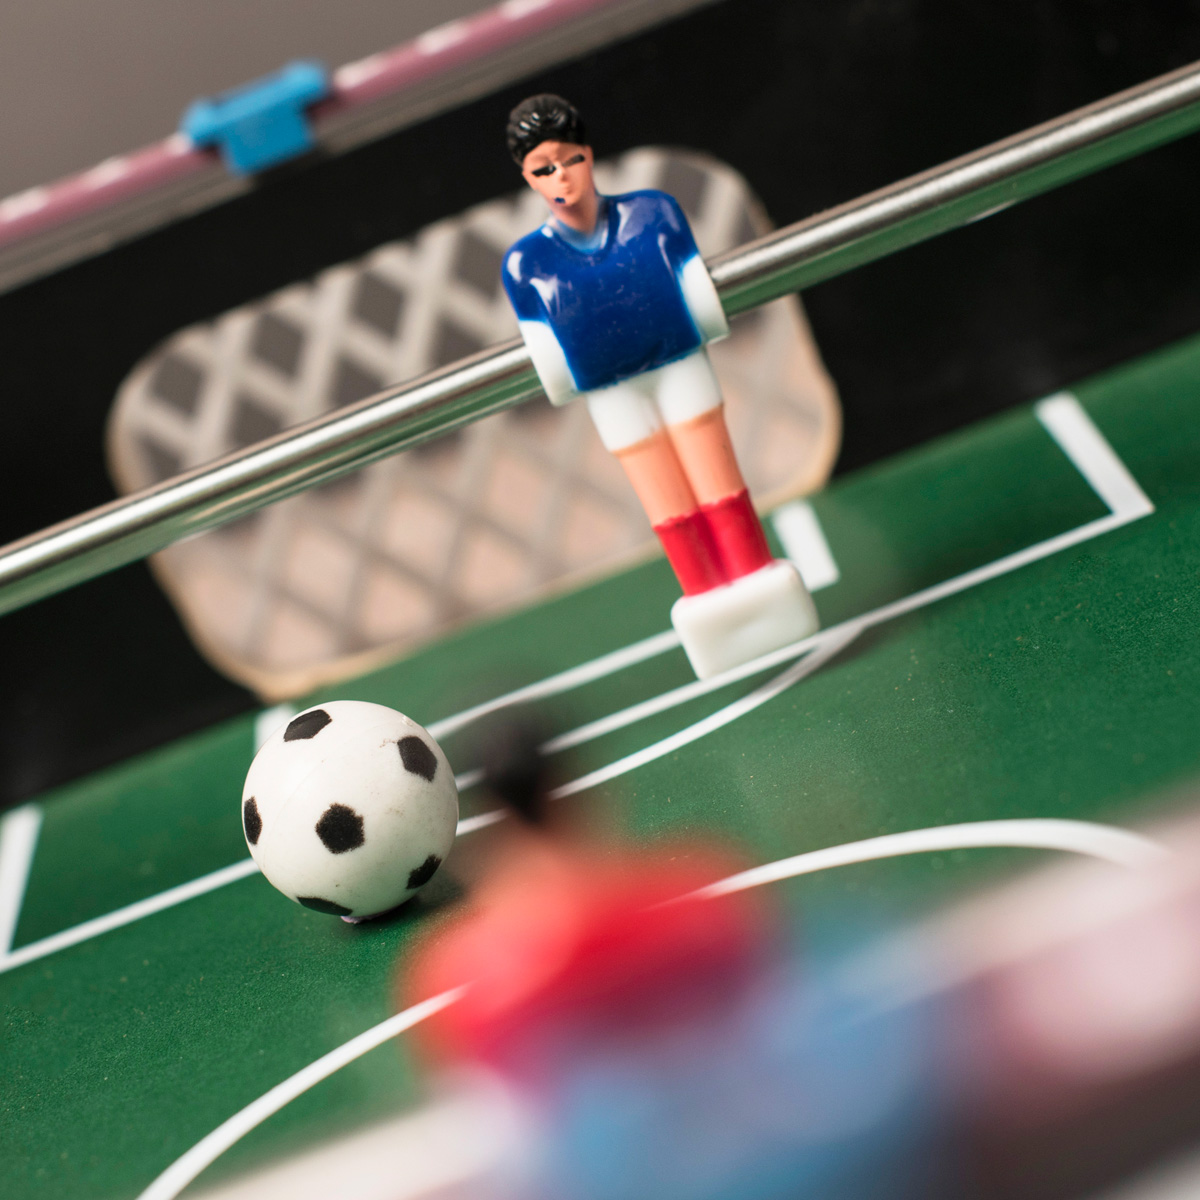 Miniature Table Football Shots Game Gettingpersonal Co Uk